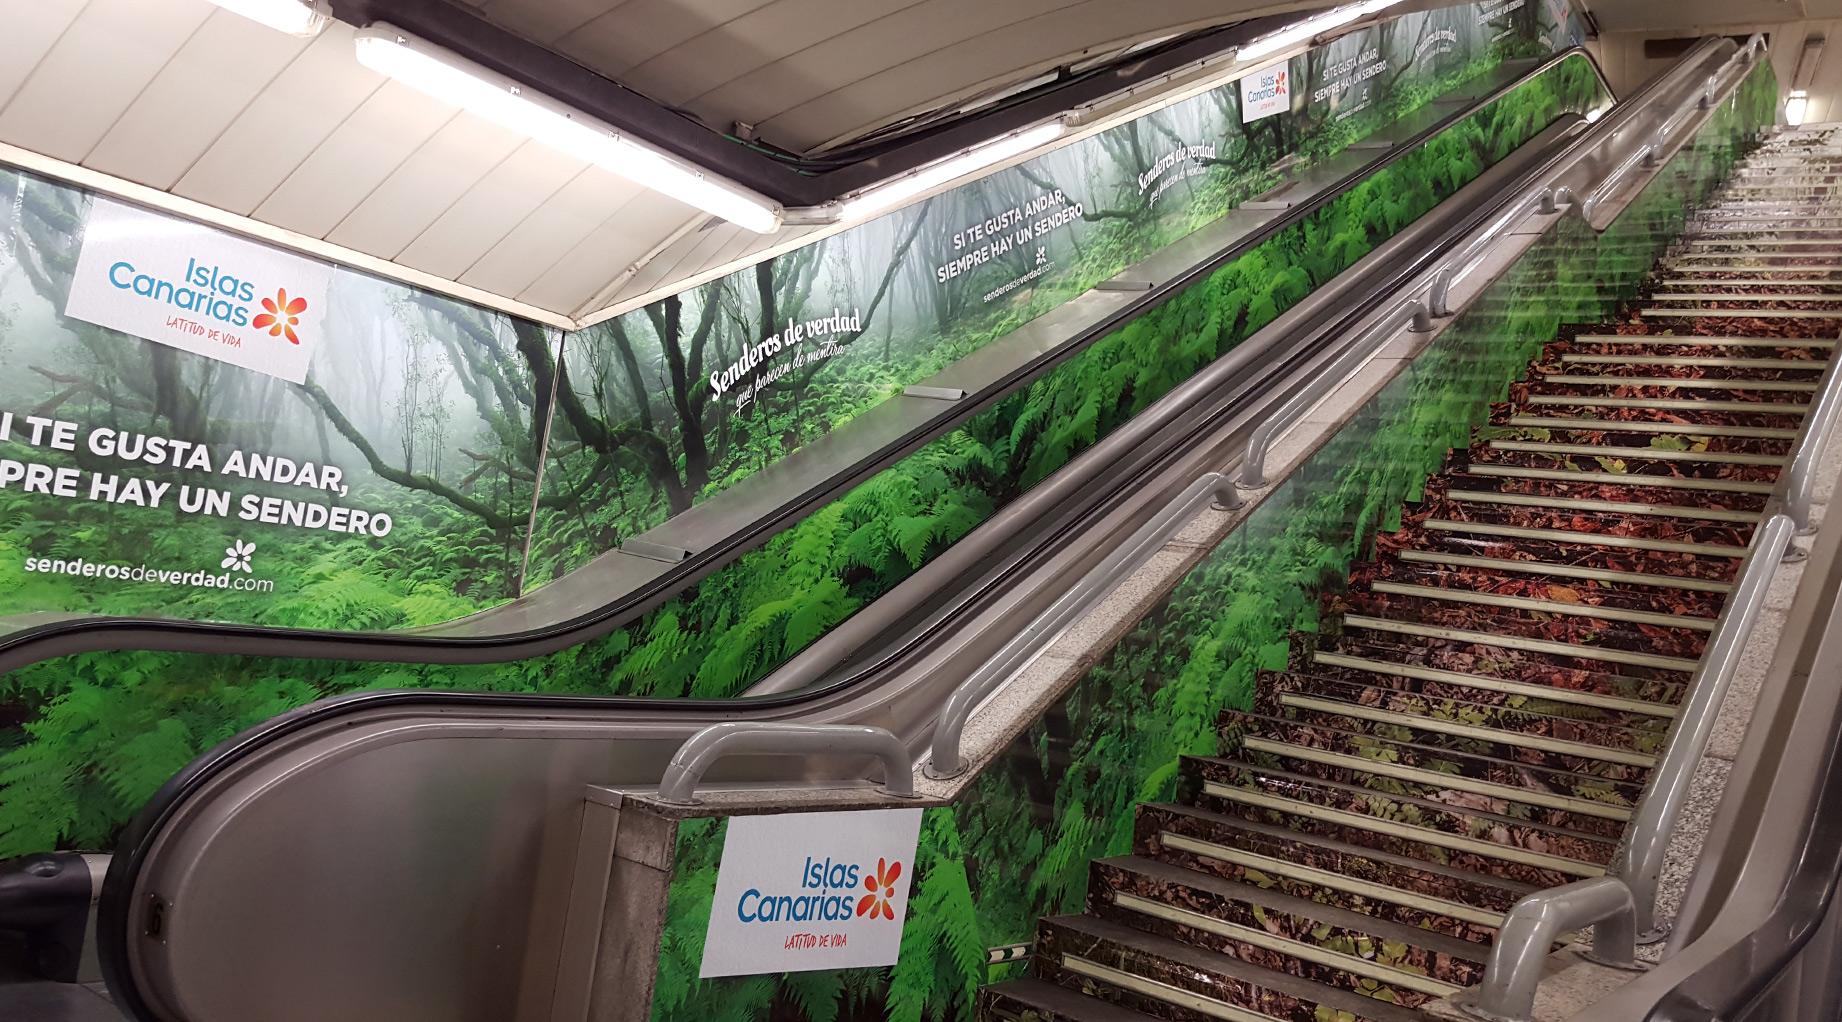 Metro Canarias